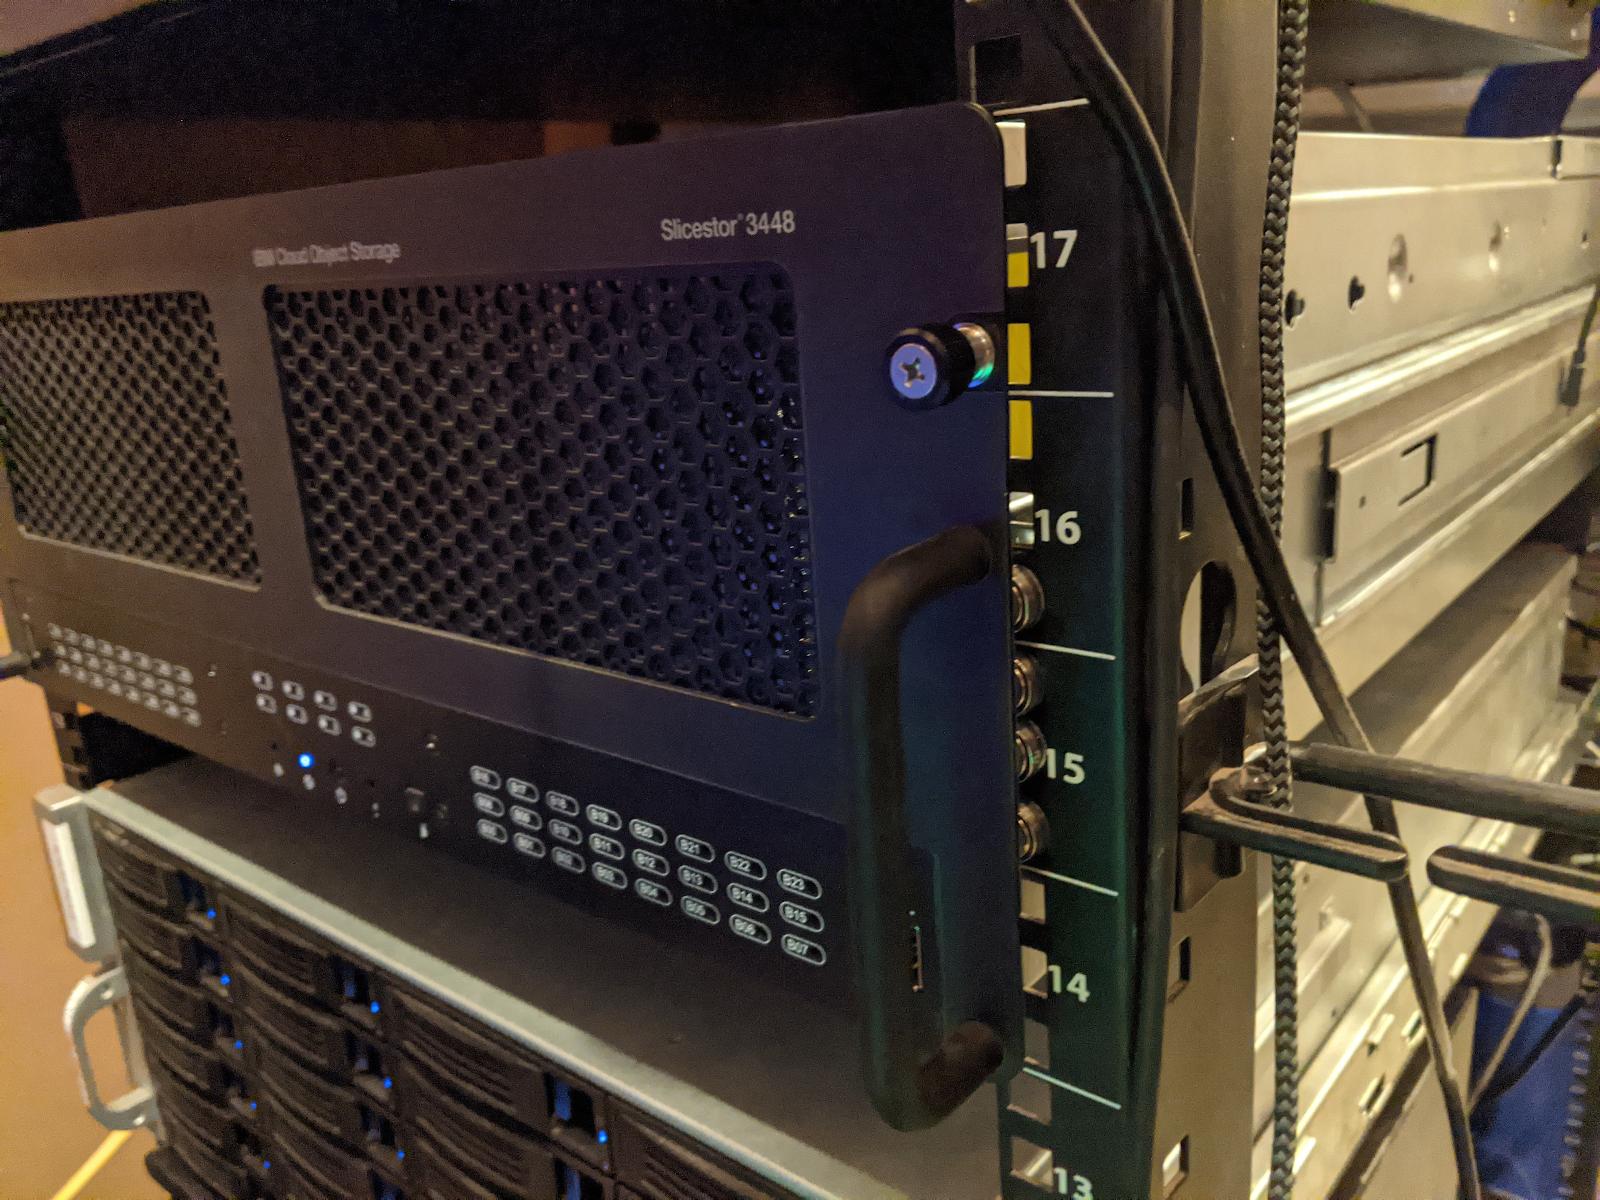 Storage VM: Part 2 – Expansion Chassis Build